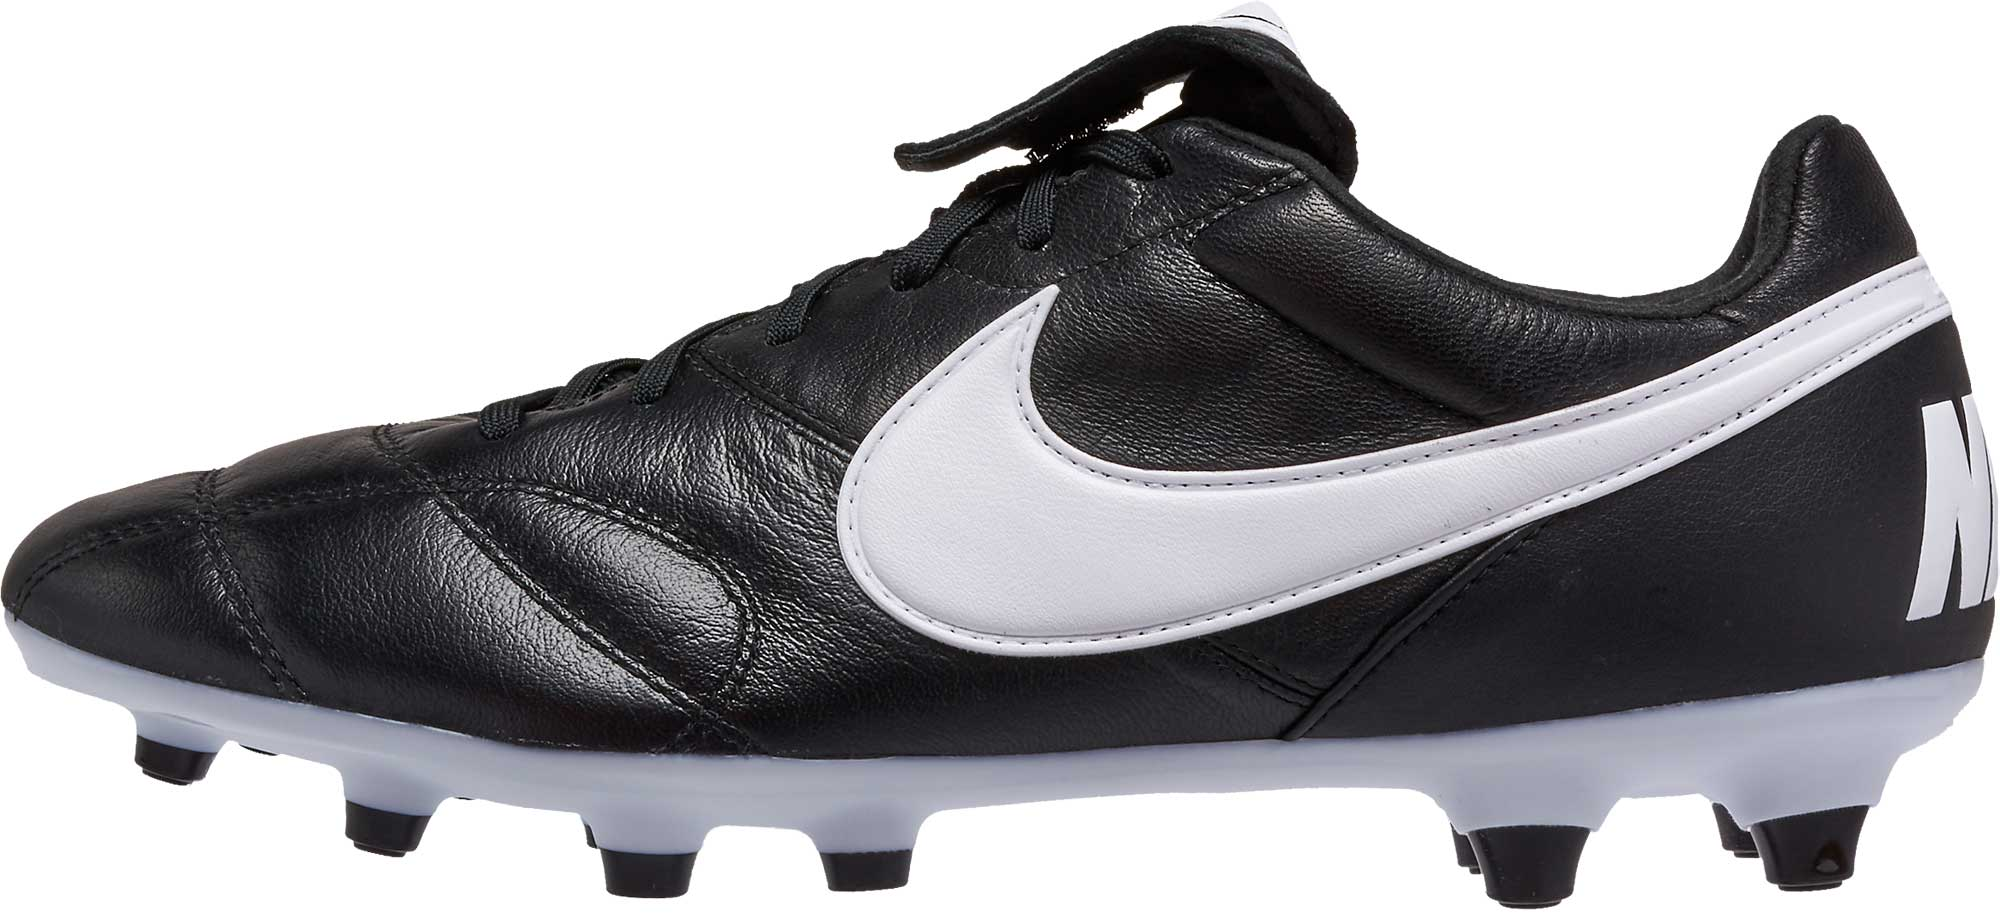 6bdbcf76b7a6 Nike Premier II FG Soccer Cleats - Black & White - Soccer Master